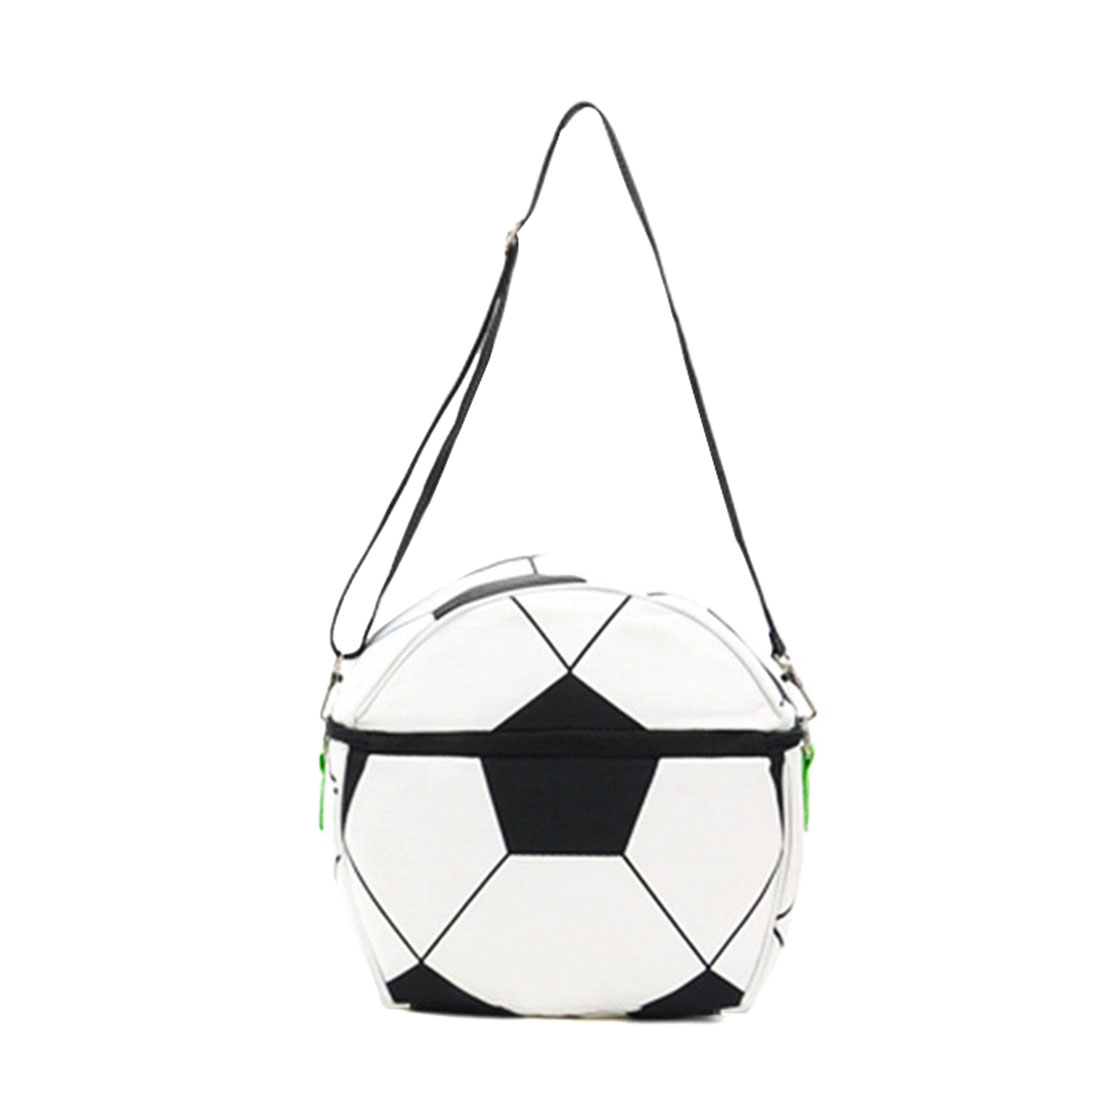 Oxford Warmer Bag color as shown & portable & hardwearing